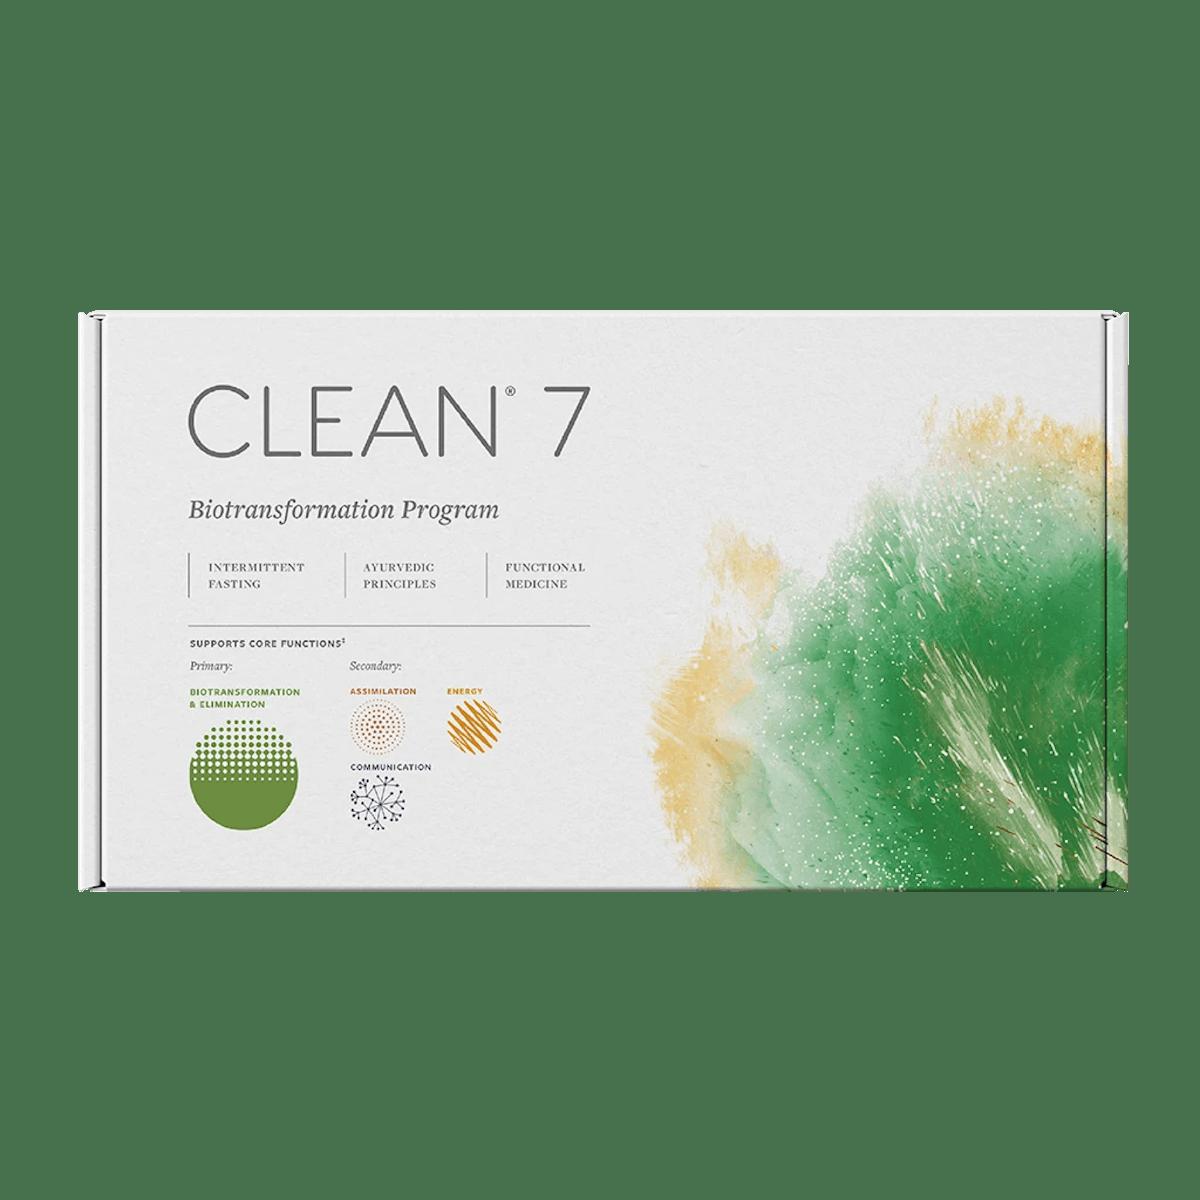 7-Day Cleanse & Detox Program